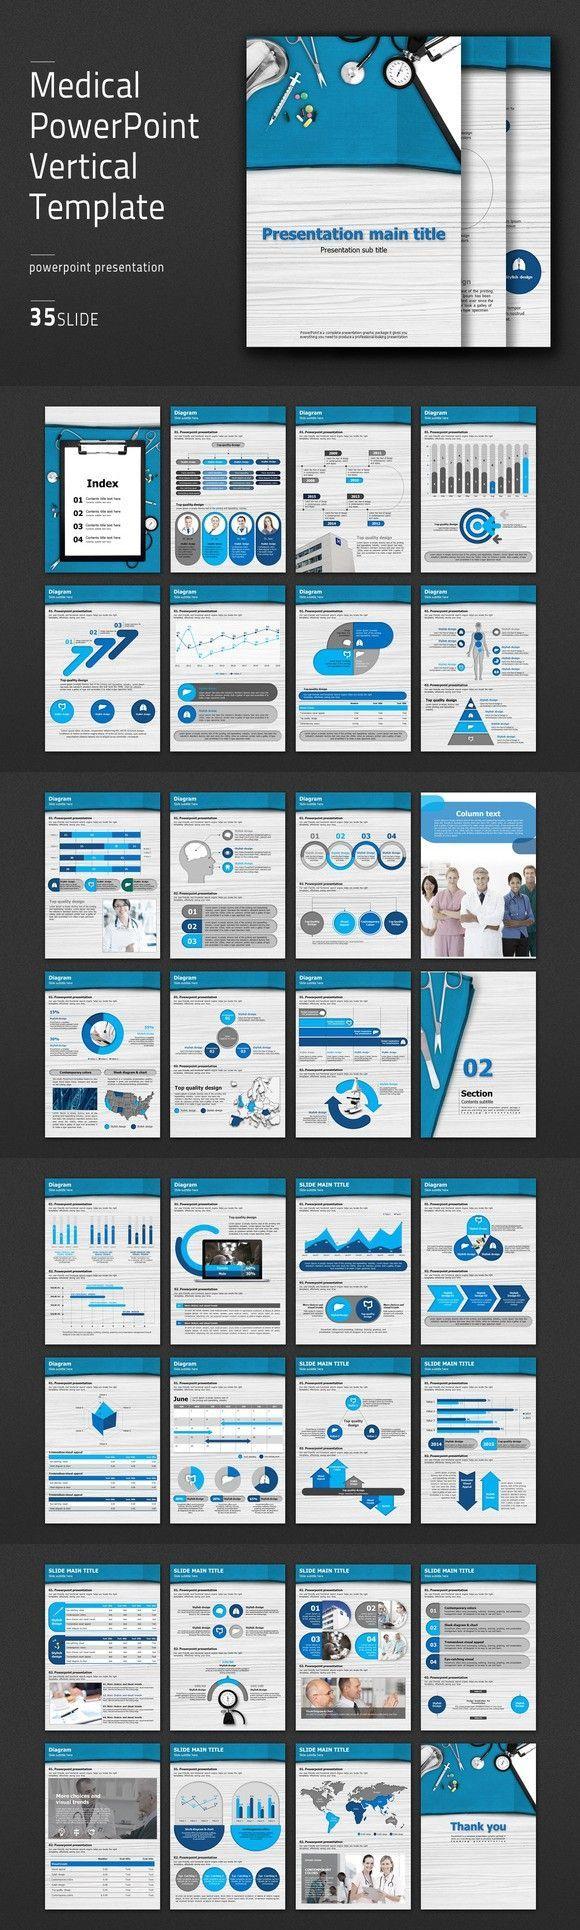 Medical infographic medical infographic medical powerpoint medical infographic toneelgroepblik Gallery